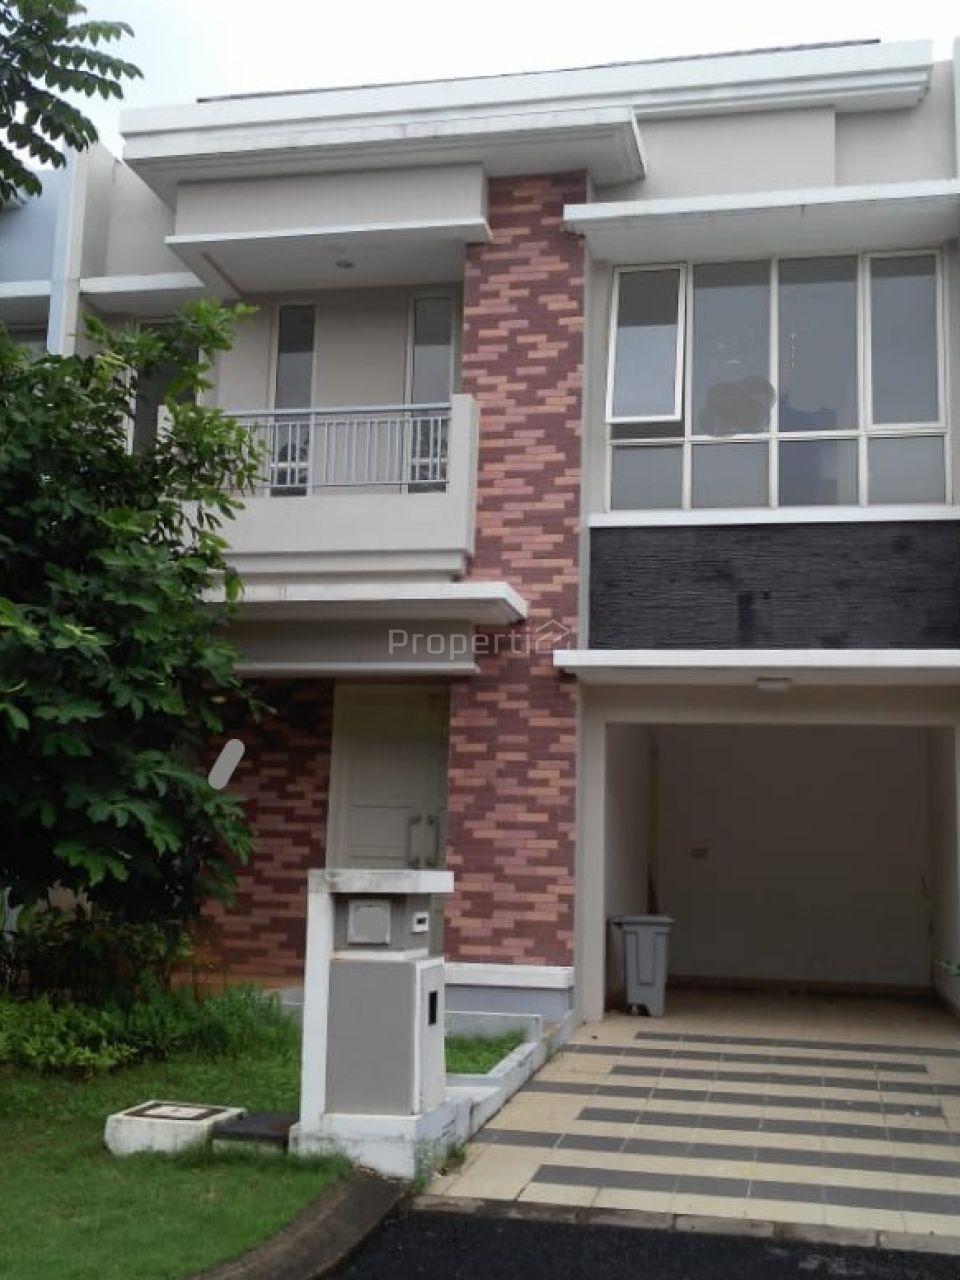 Rumah Baru di Faraday, Gading Serpong, Banten